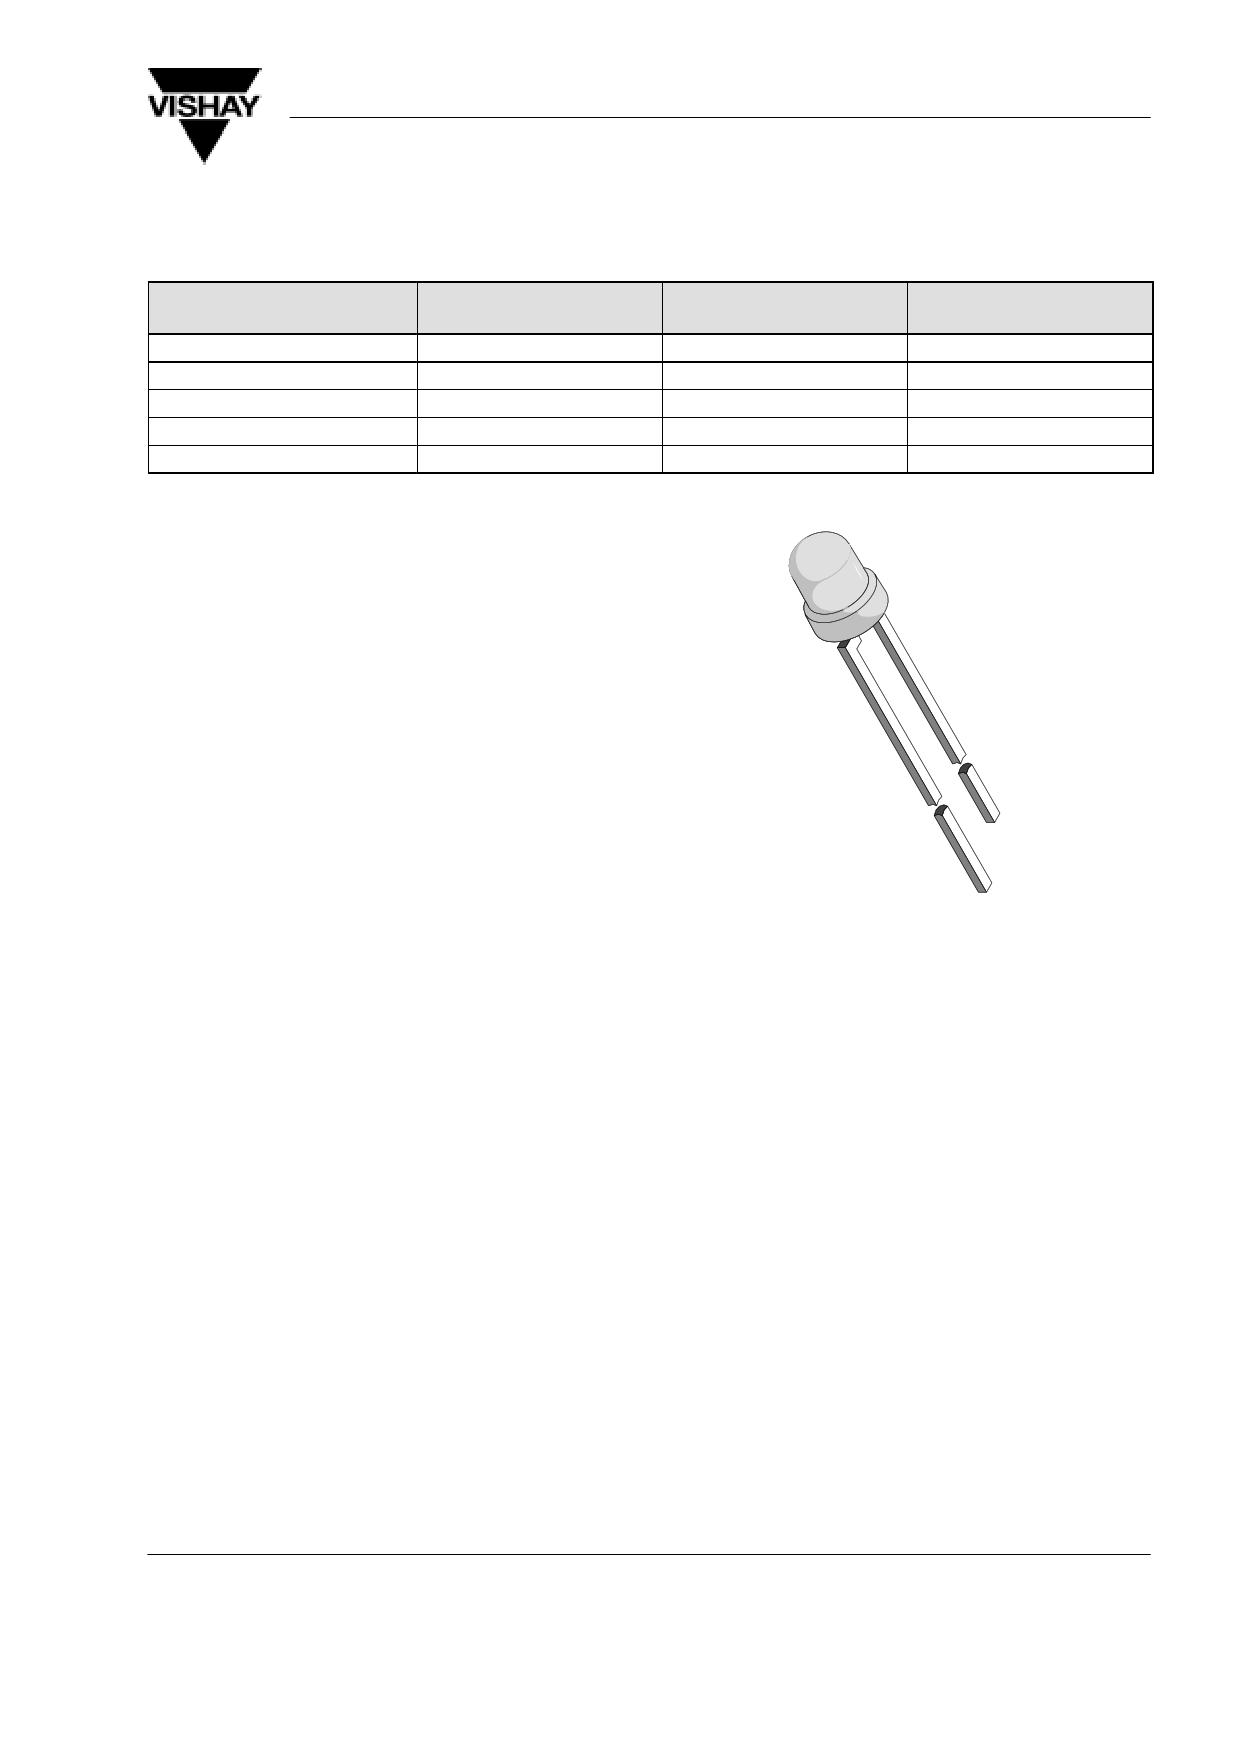 TLRG4400 Даташит, Описание, Даташиты